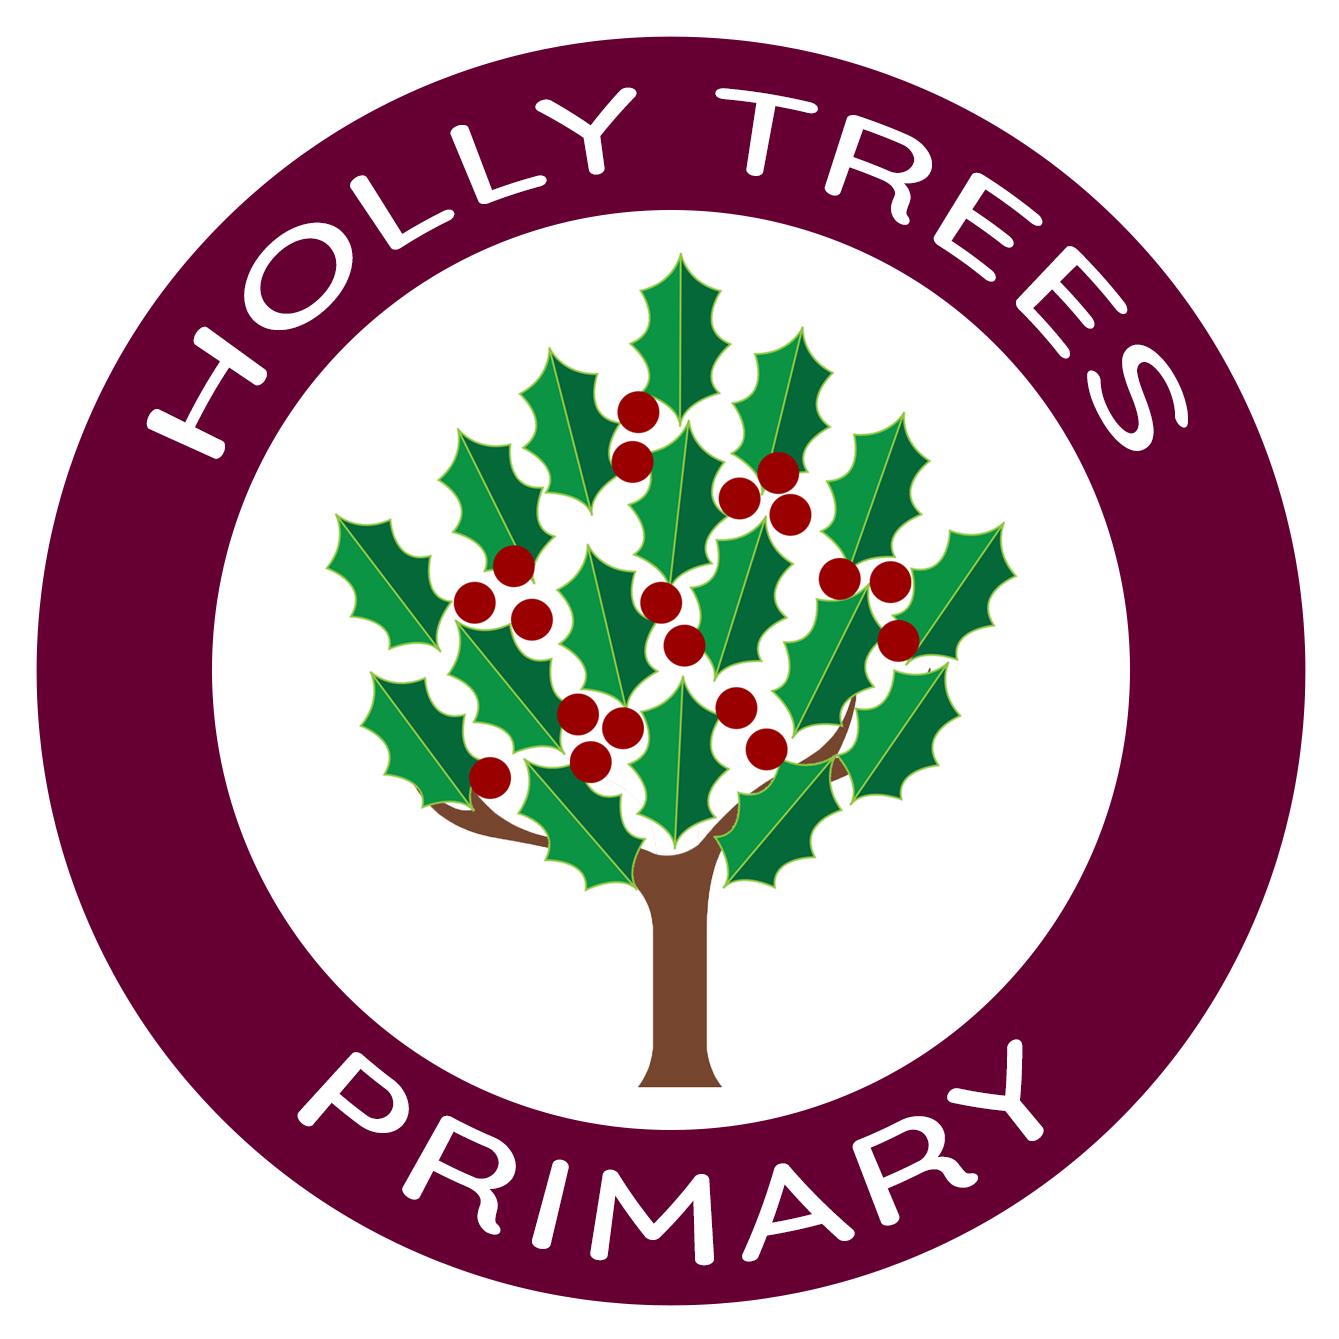 Holly Trees Primary School Logo.jpg